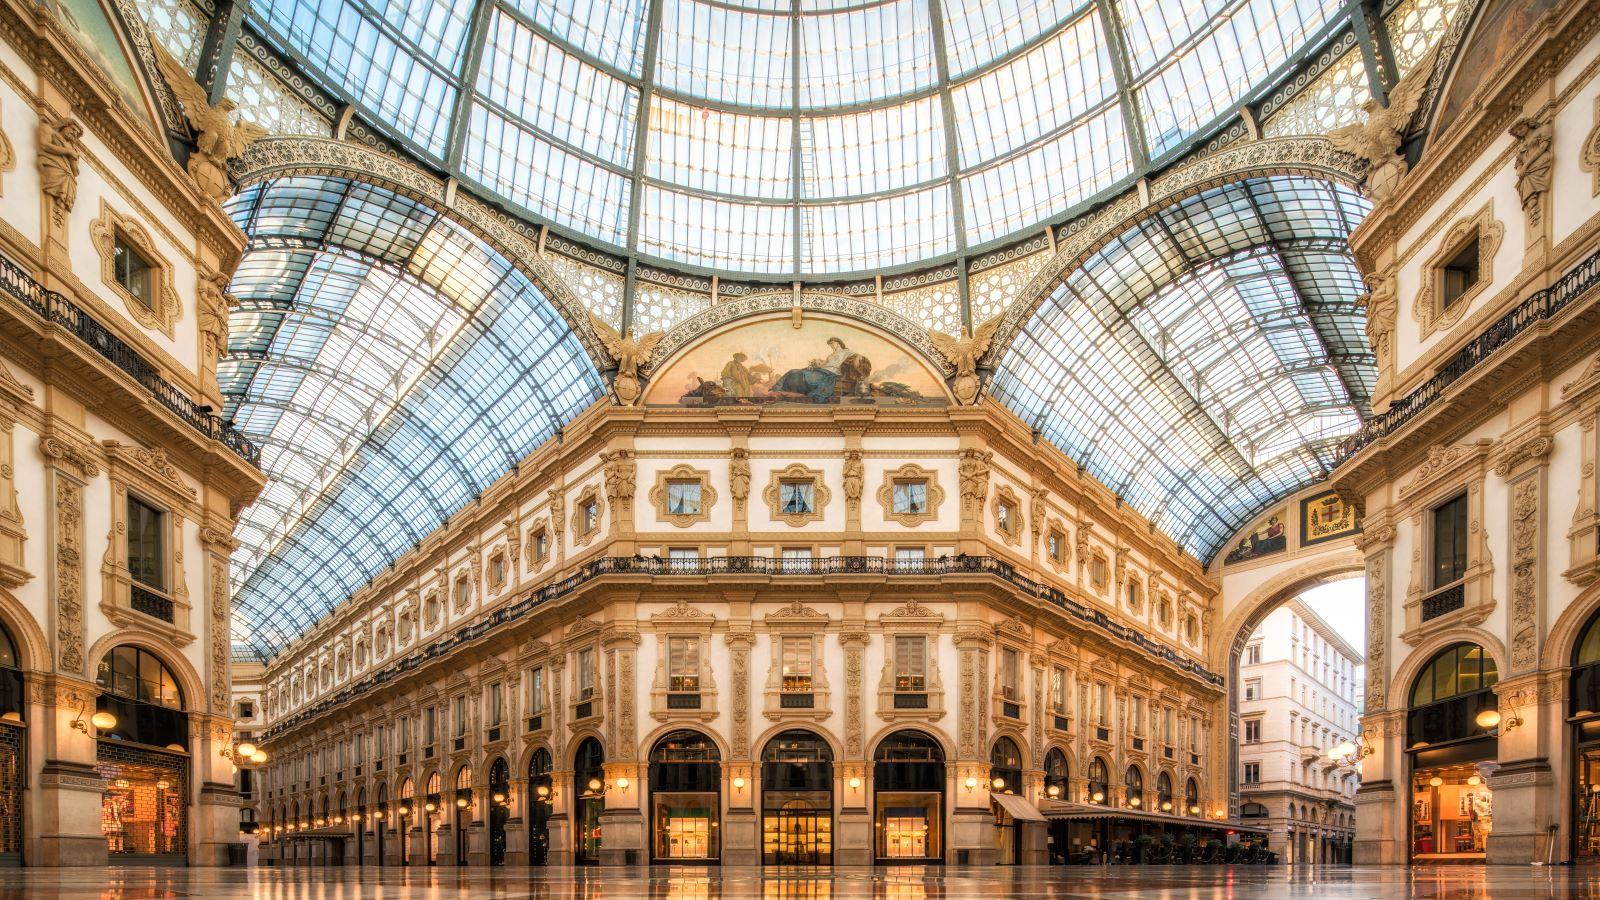 Milan, Galleria Vittorio Emanuele II, Shopping Mall, Italy, Europe